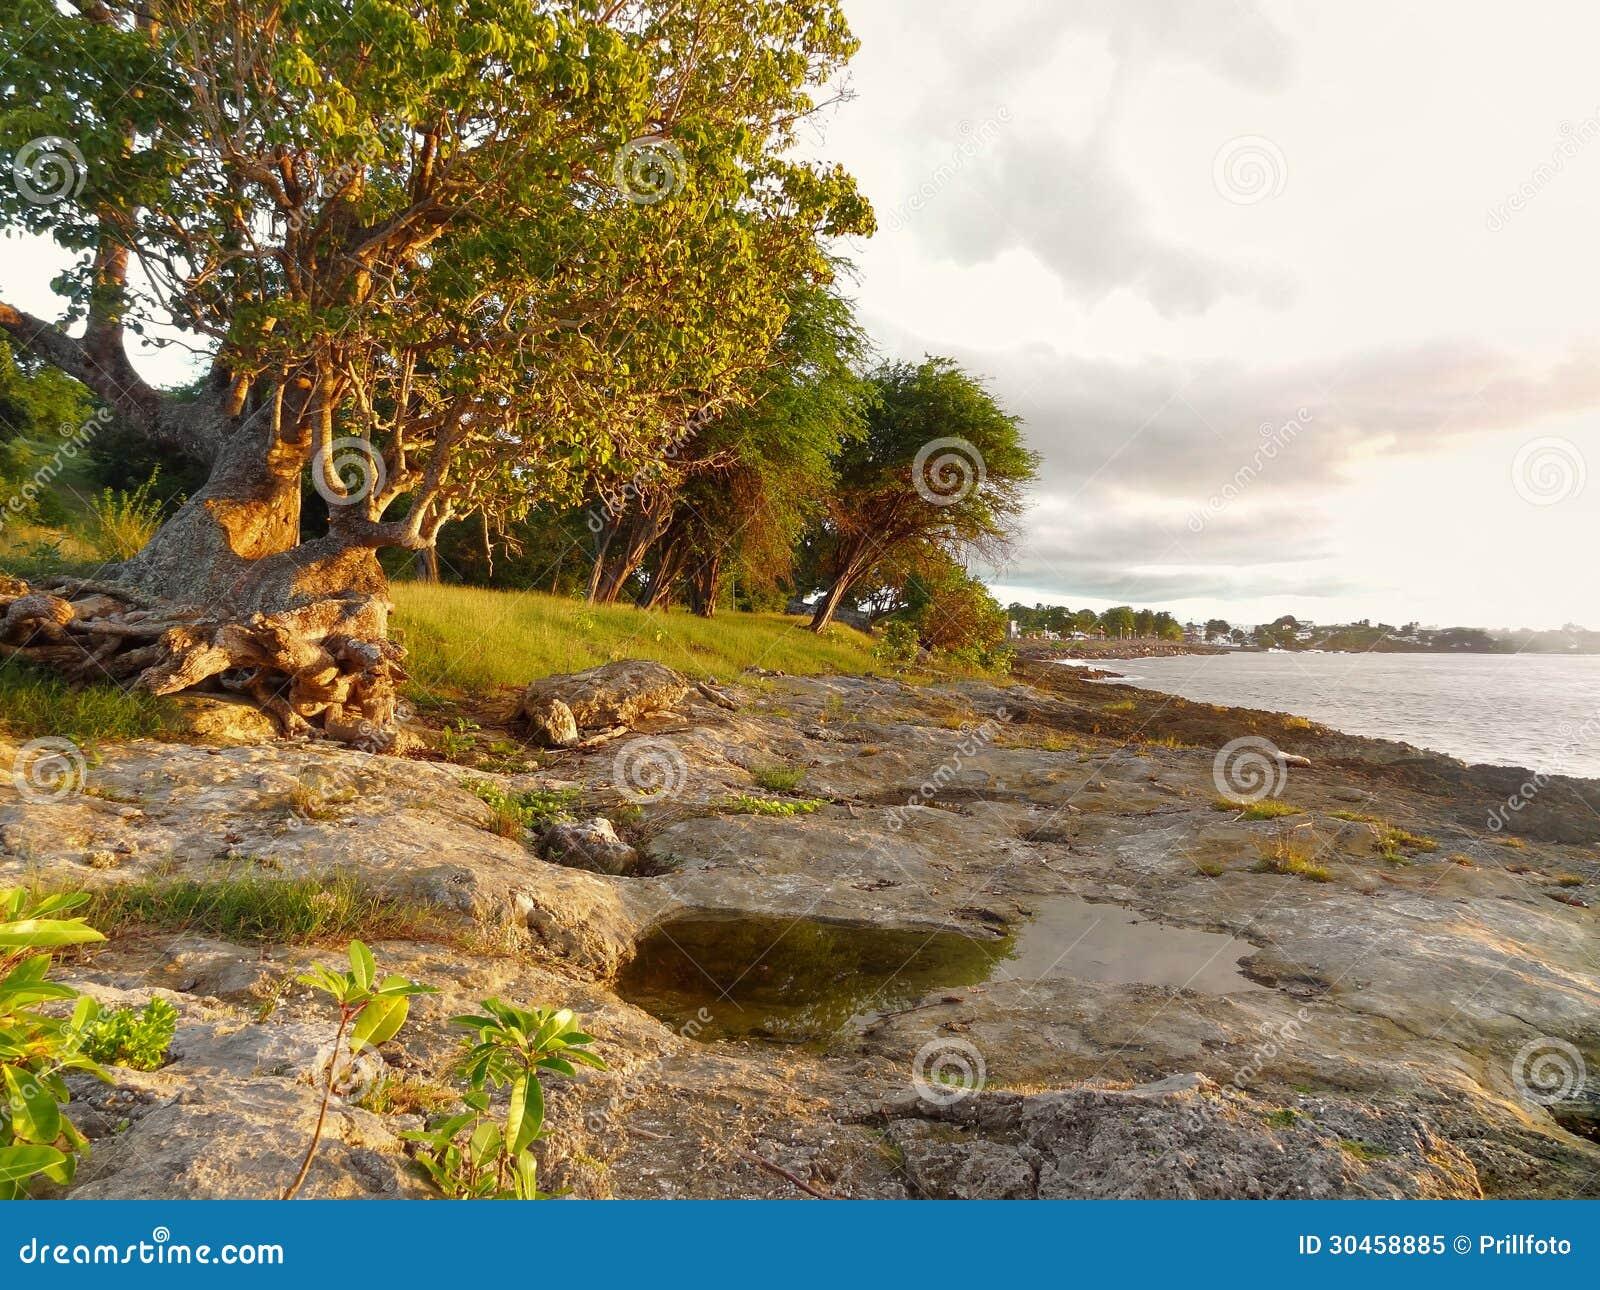 Coastal Scenery At Guadeloupe Royalty Free Stock Photo ...